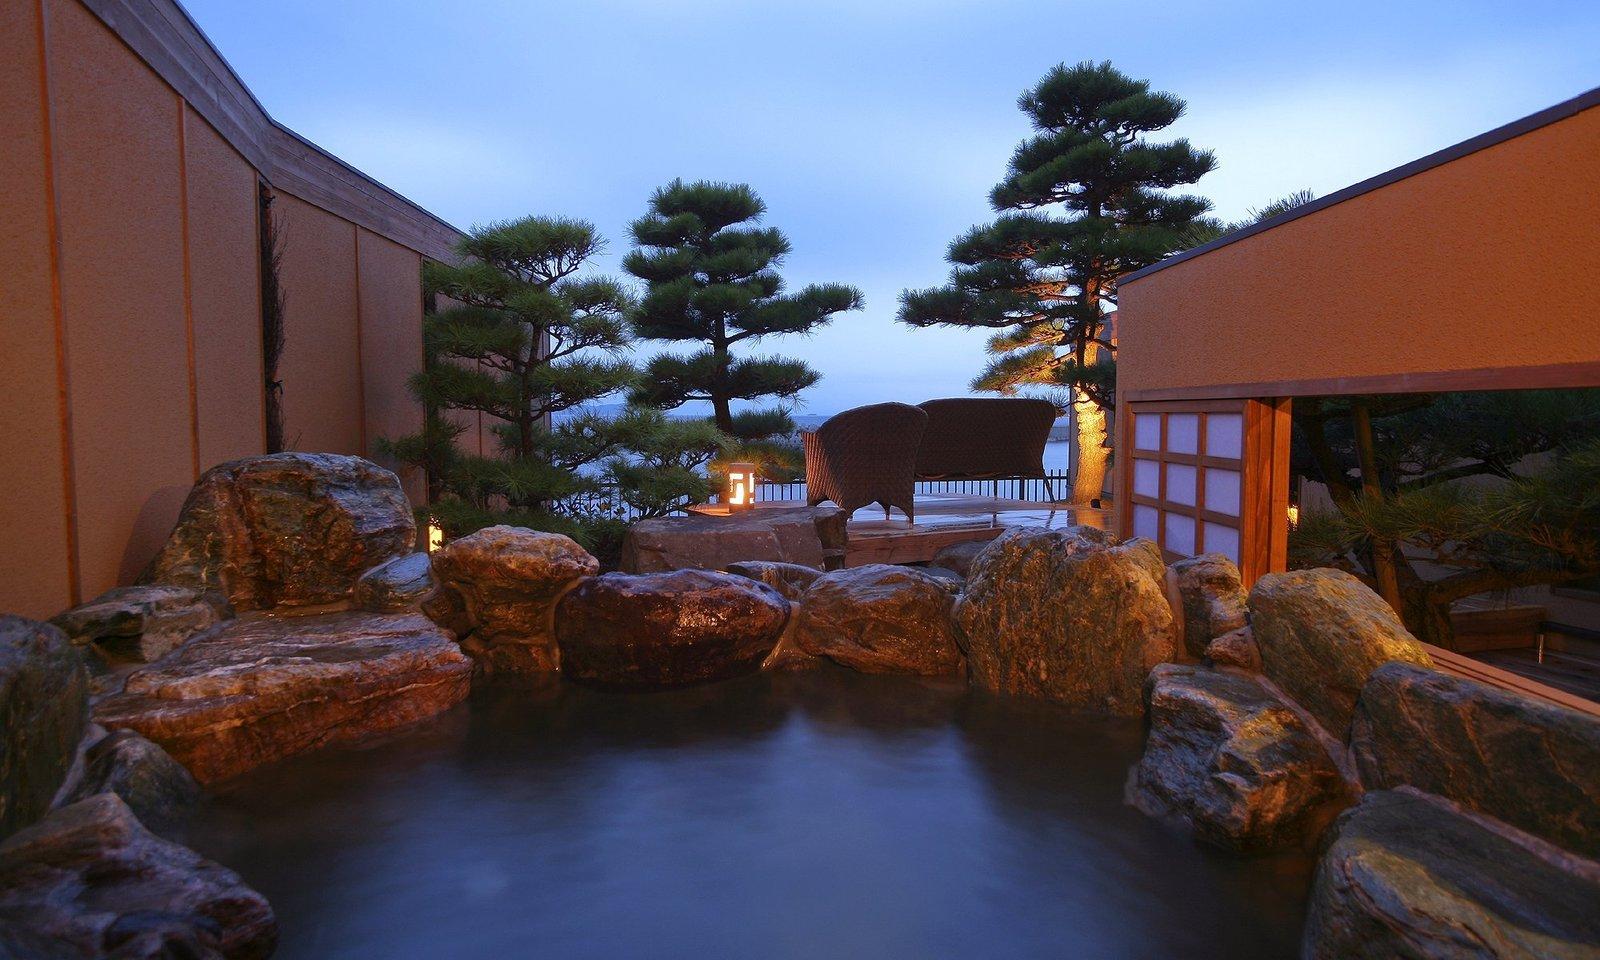 Outdoor, Trees, and Boulders Villa Rakuen in Hyogo, Japan  Villa Rakuen